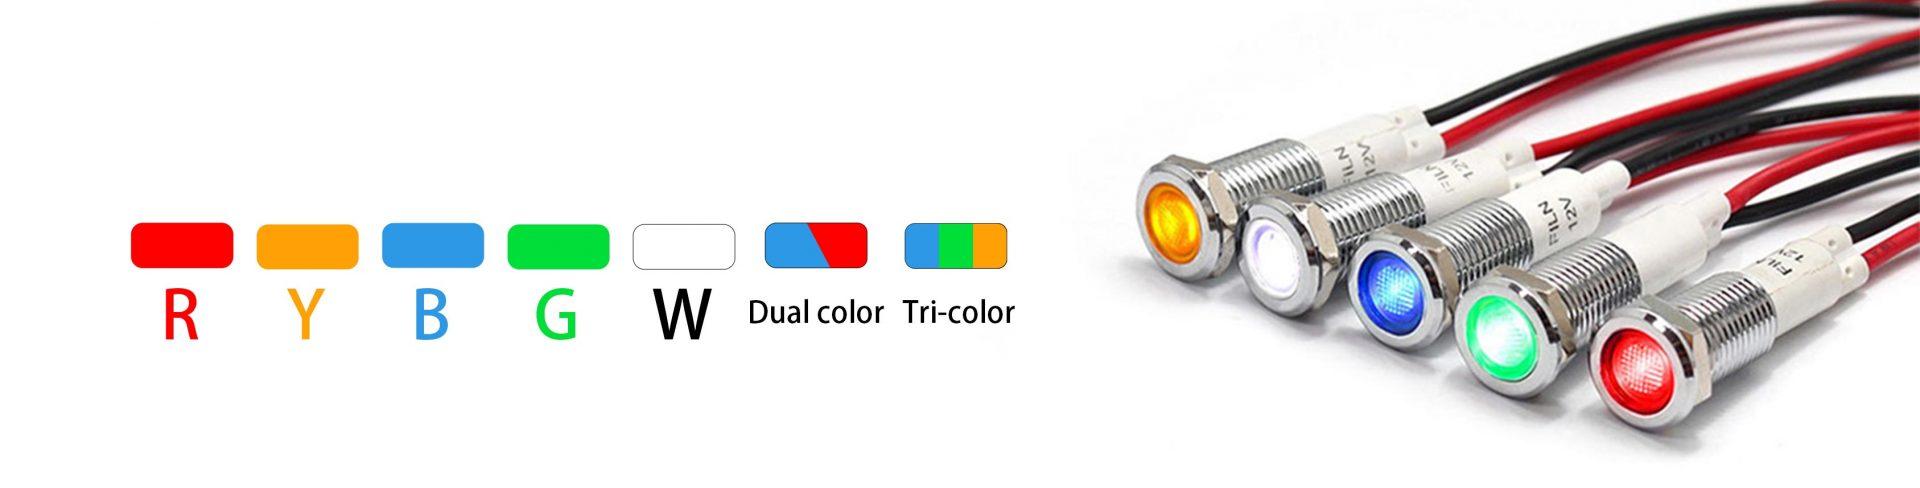 metal indicator lightss